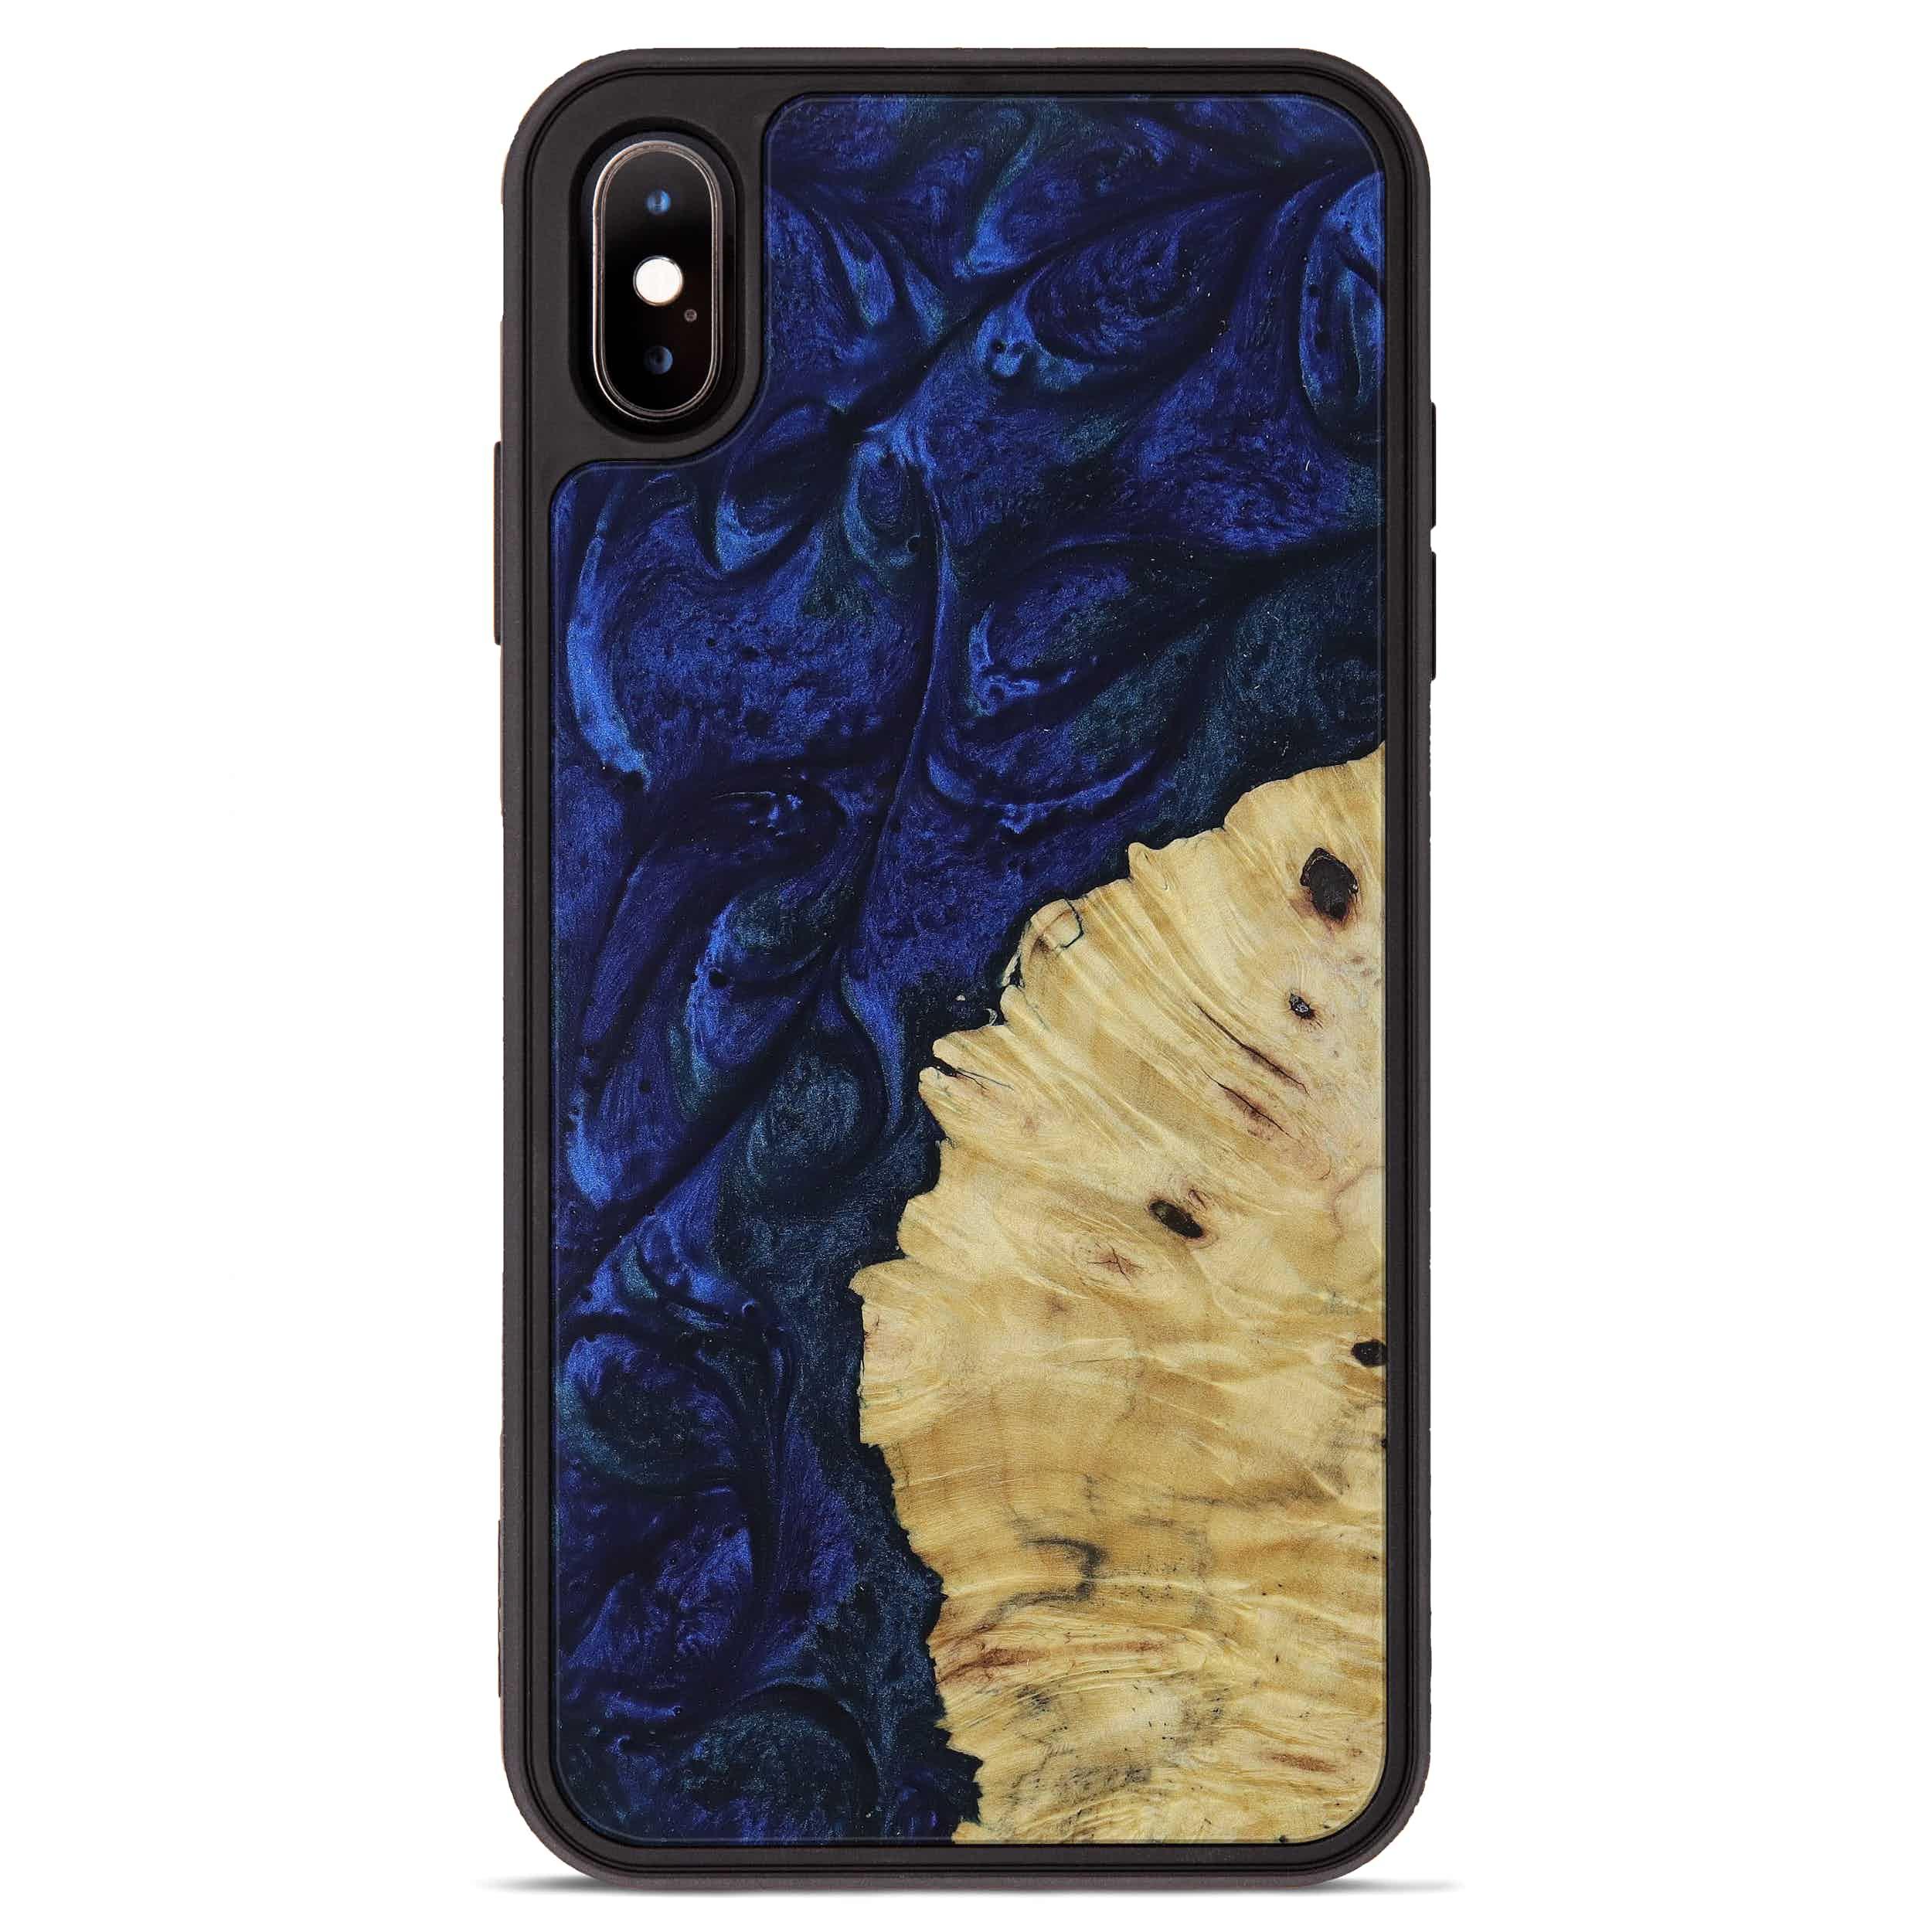 iPhone Xs Max Wood+Resin Phone Case - Julissa (Dark Blue, 397879)